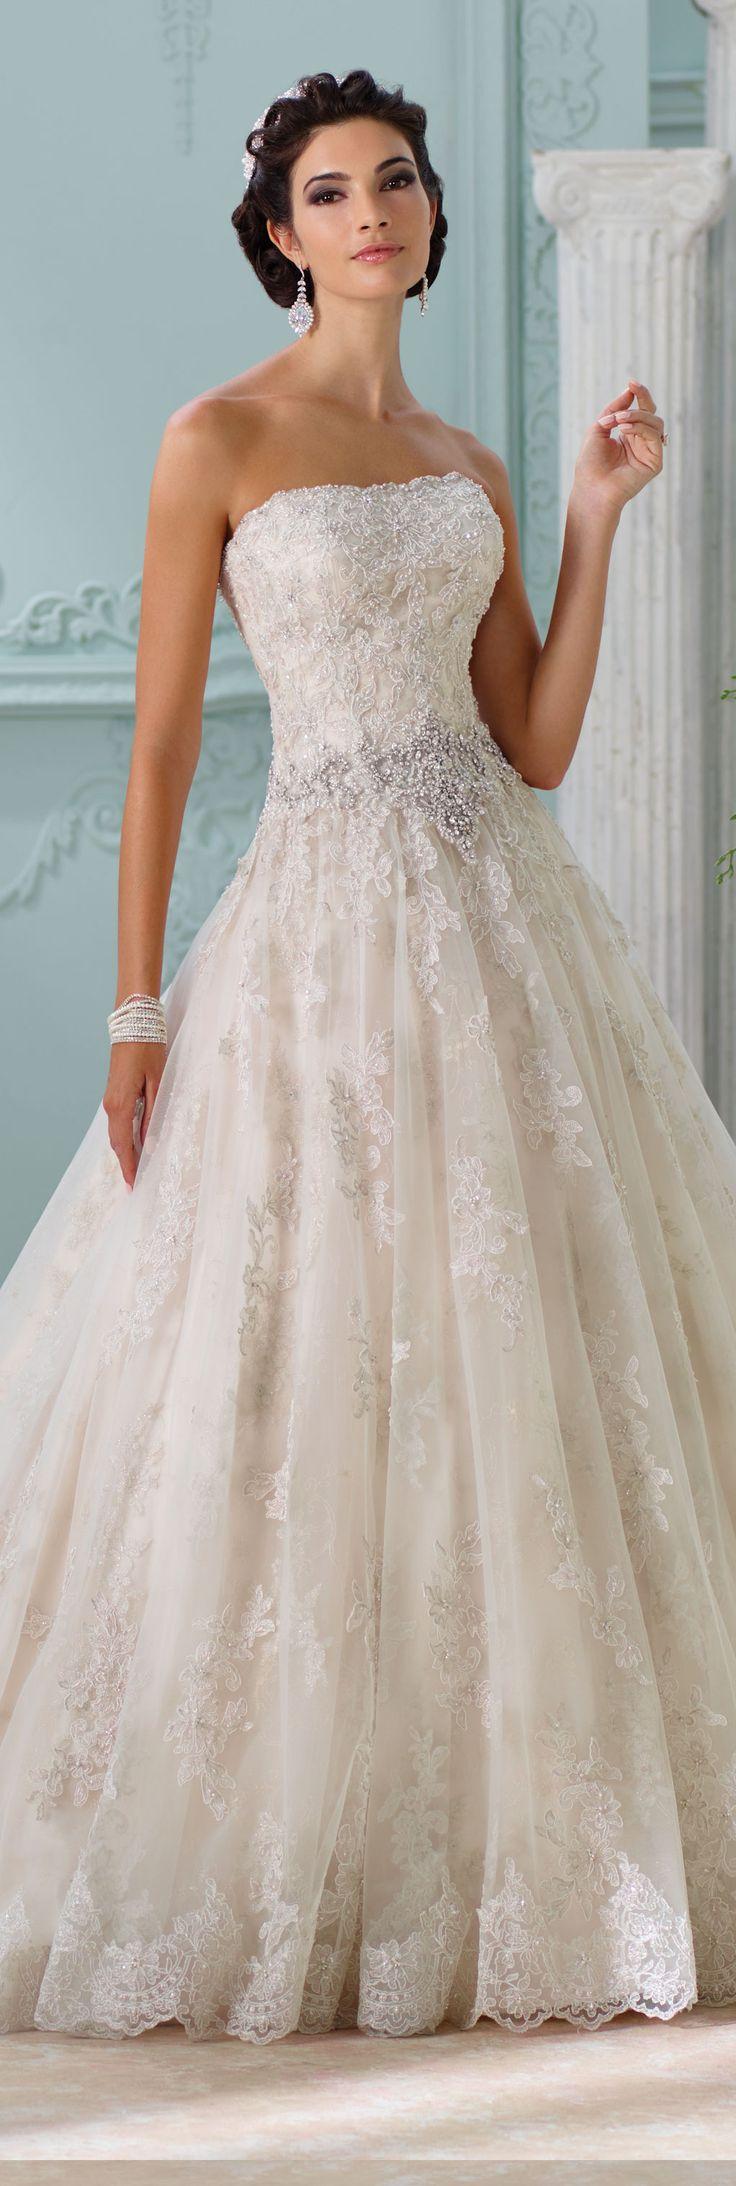 The David Tutera For Mon Cheri Spring 2016 Wedding Gown Collection Style No 116230